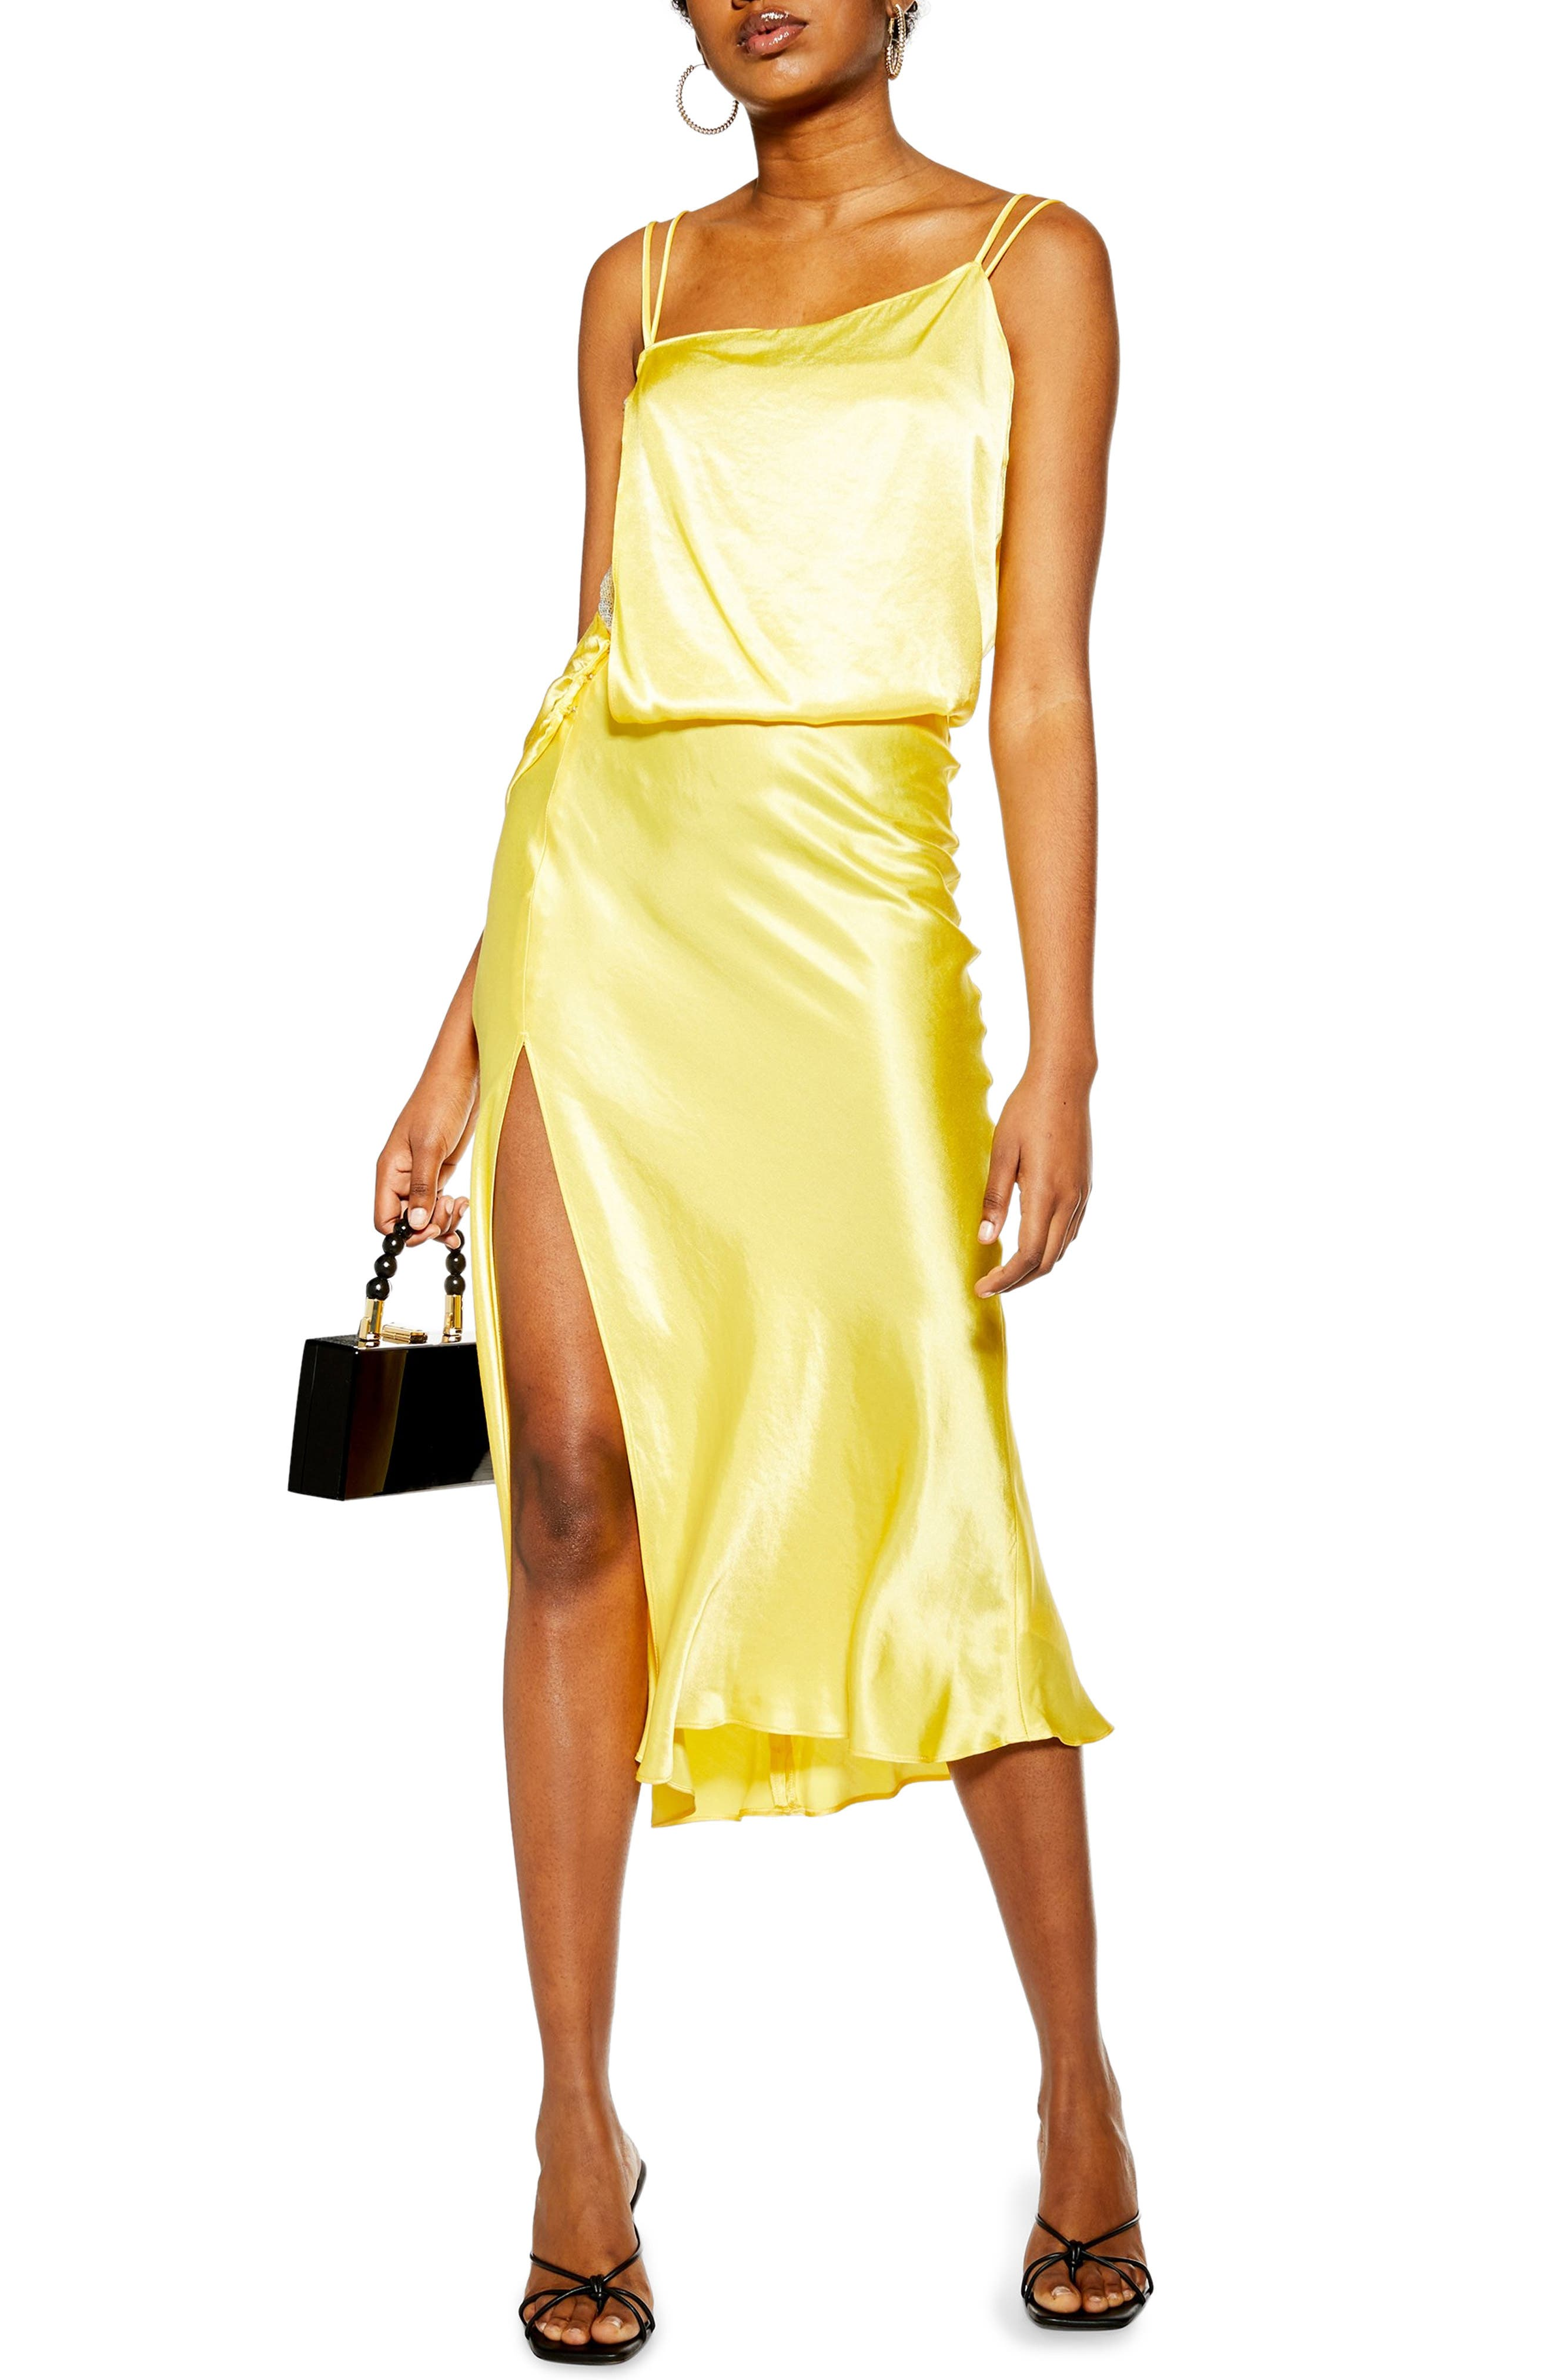 Topshop Embroidered Panel Satin Slipdress, US (fits like 0-2) - Yellow